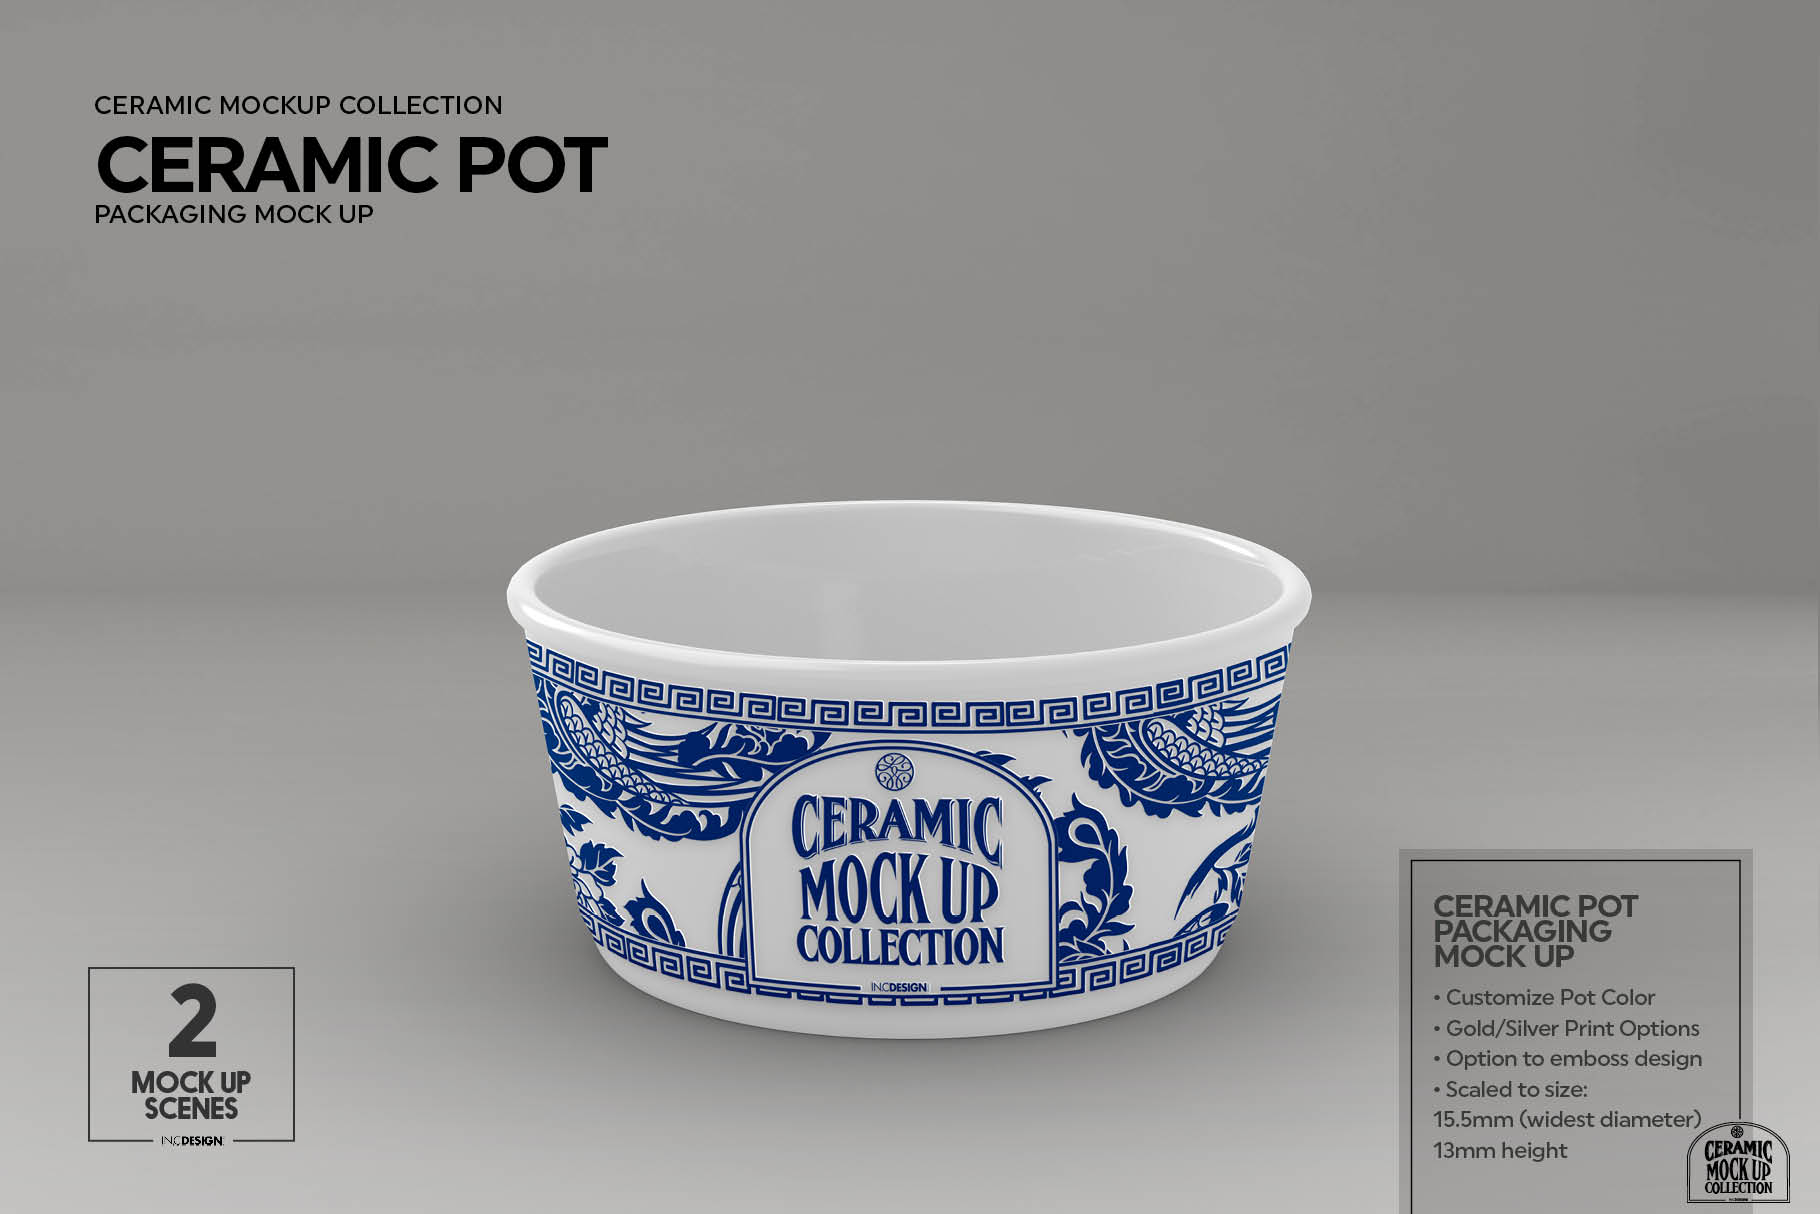 Ceramic Pot Packaging Mock Up example image 5